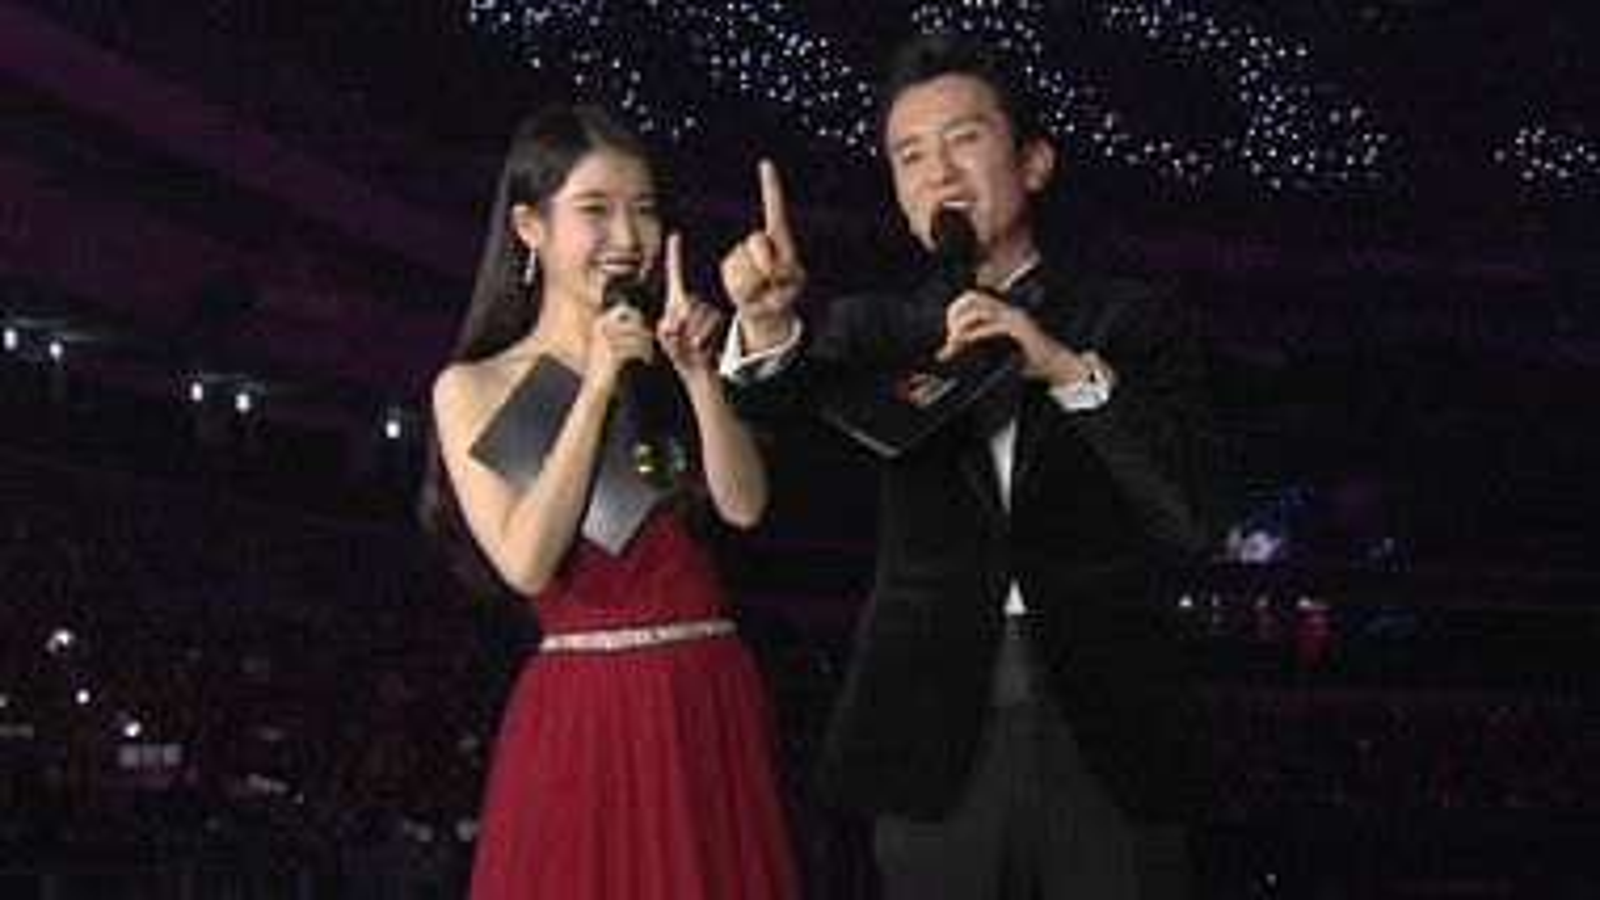 2017 SBS Gayo Daejeon_Music Festival Episode 1